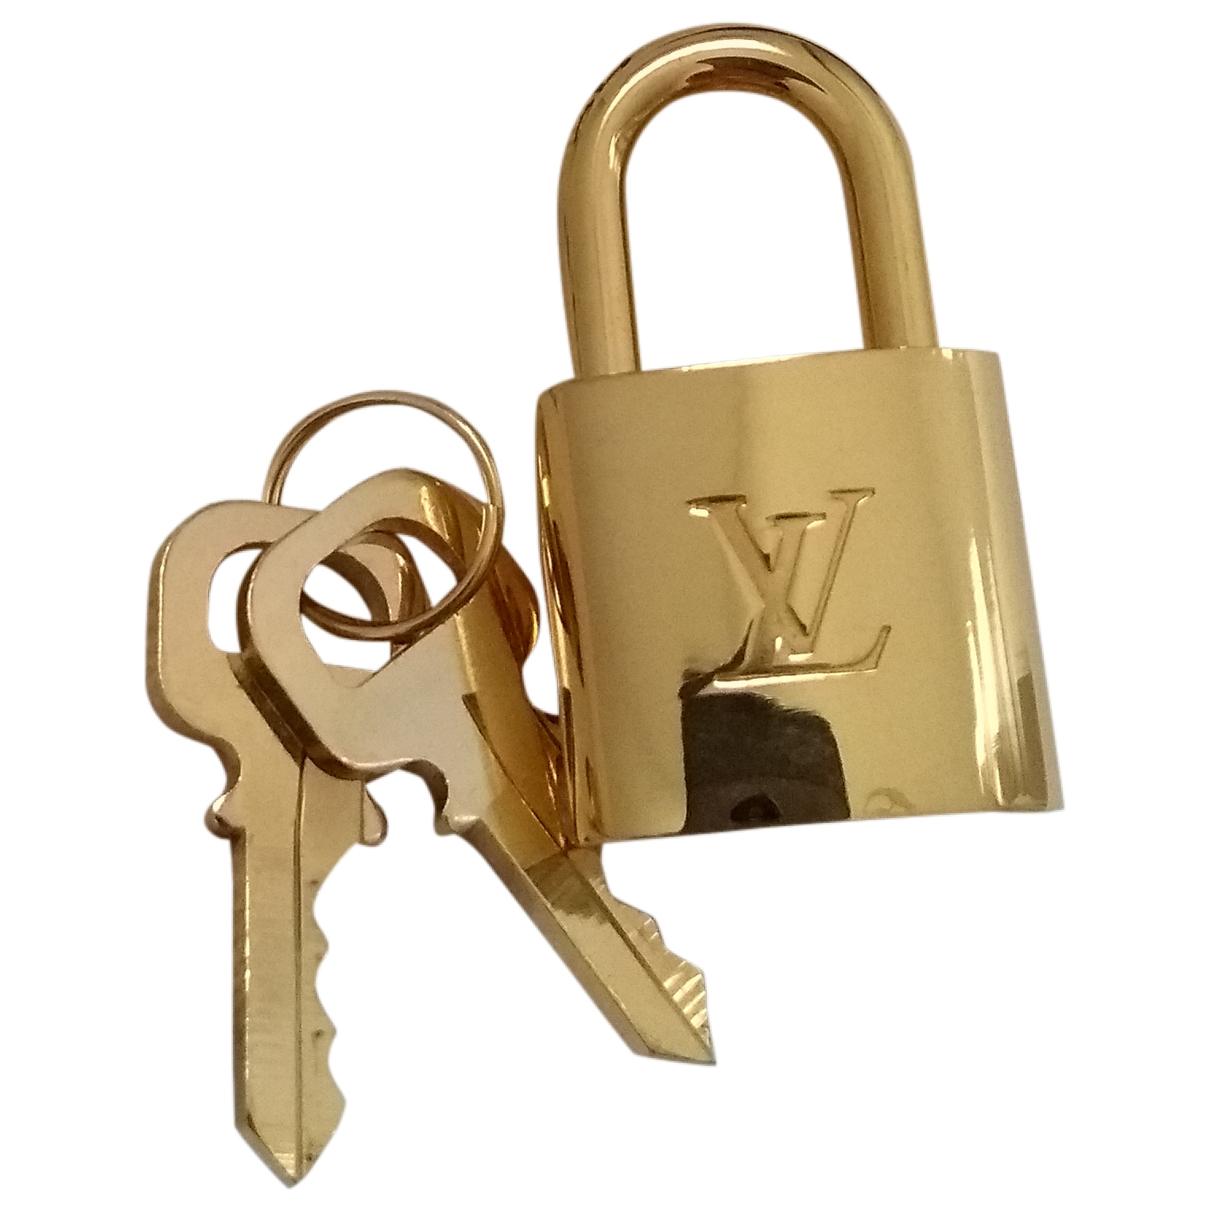 Louis Vuitton Cadenas Taschenschmuck in  Gold Metall